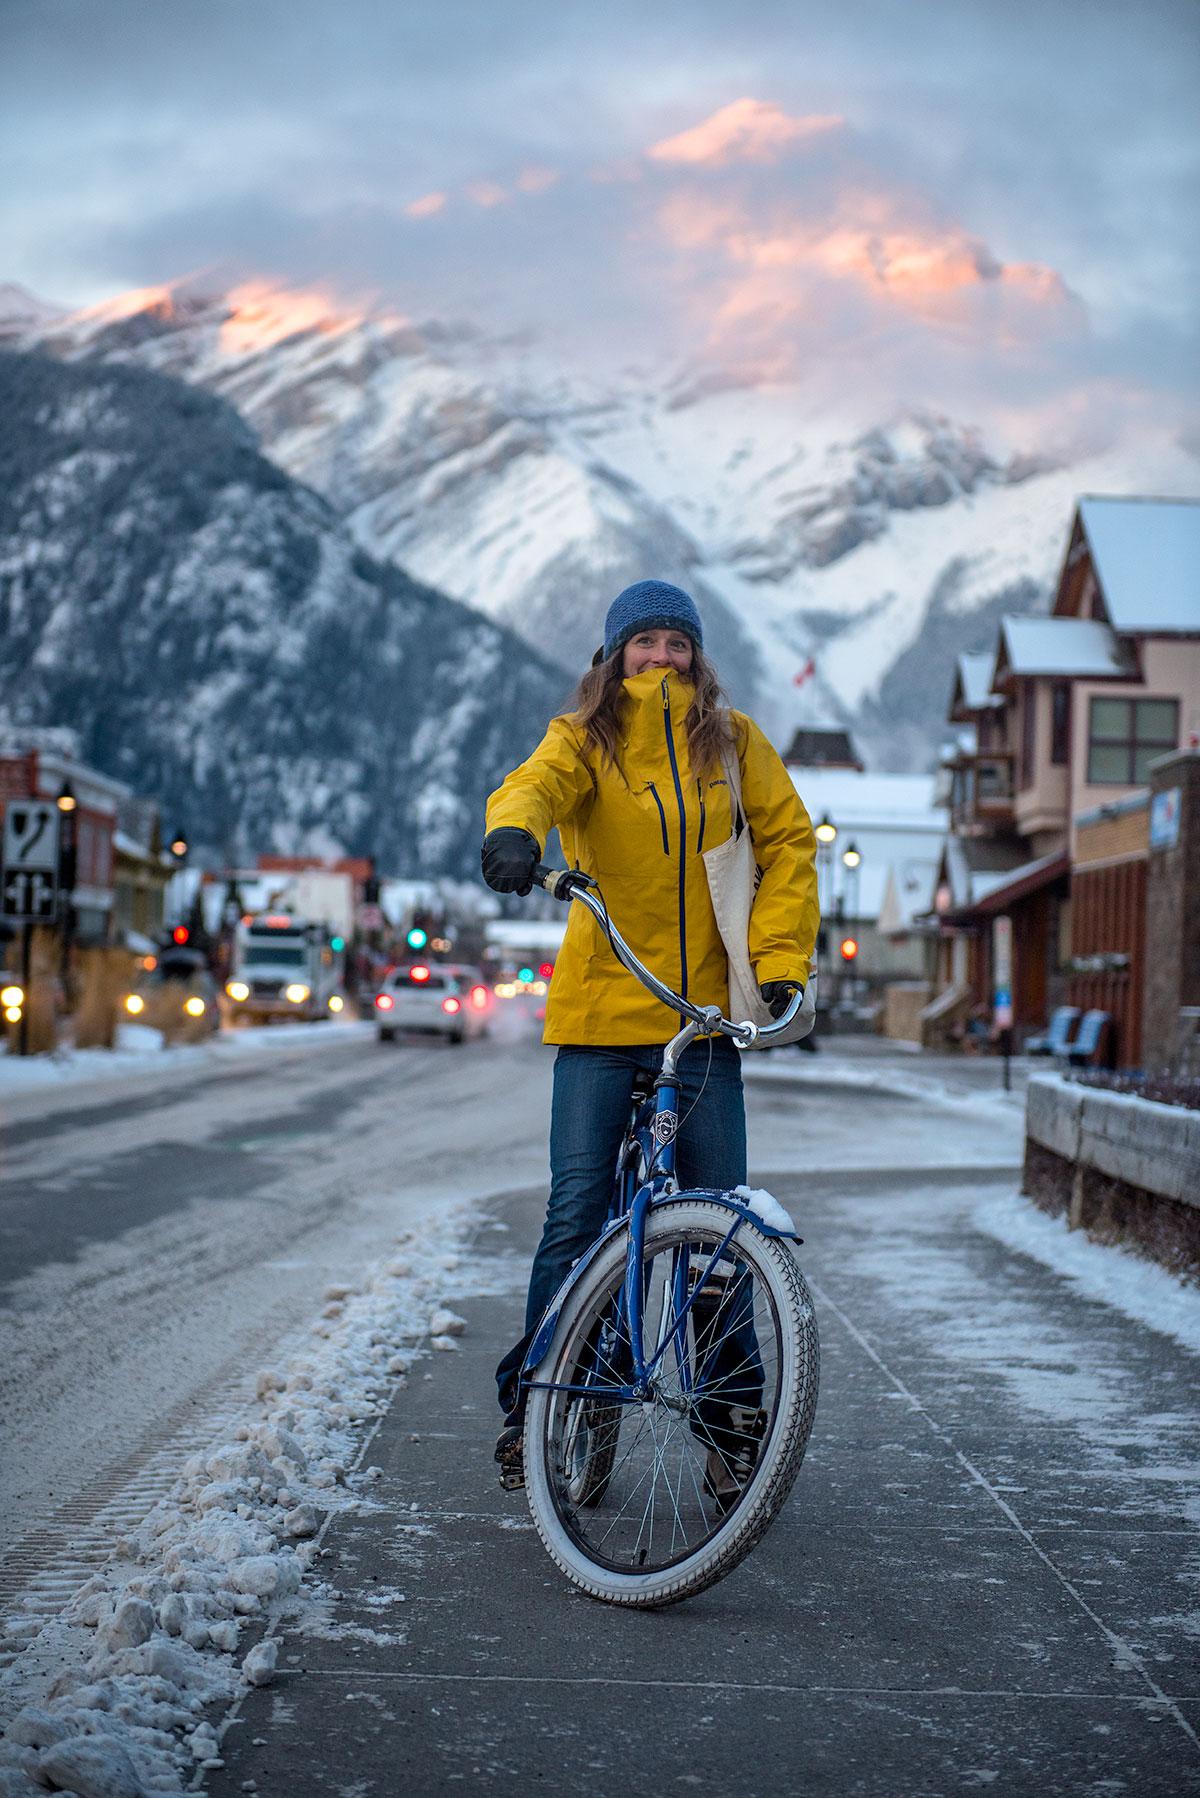 austin-trigg-patagonia-banff-alberta-winter-downtown-lifestyle-sunset-mountain-town-road-bicycle-yoga.jpg